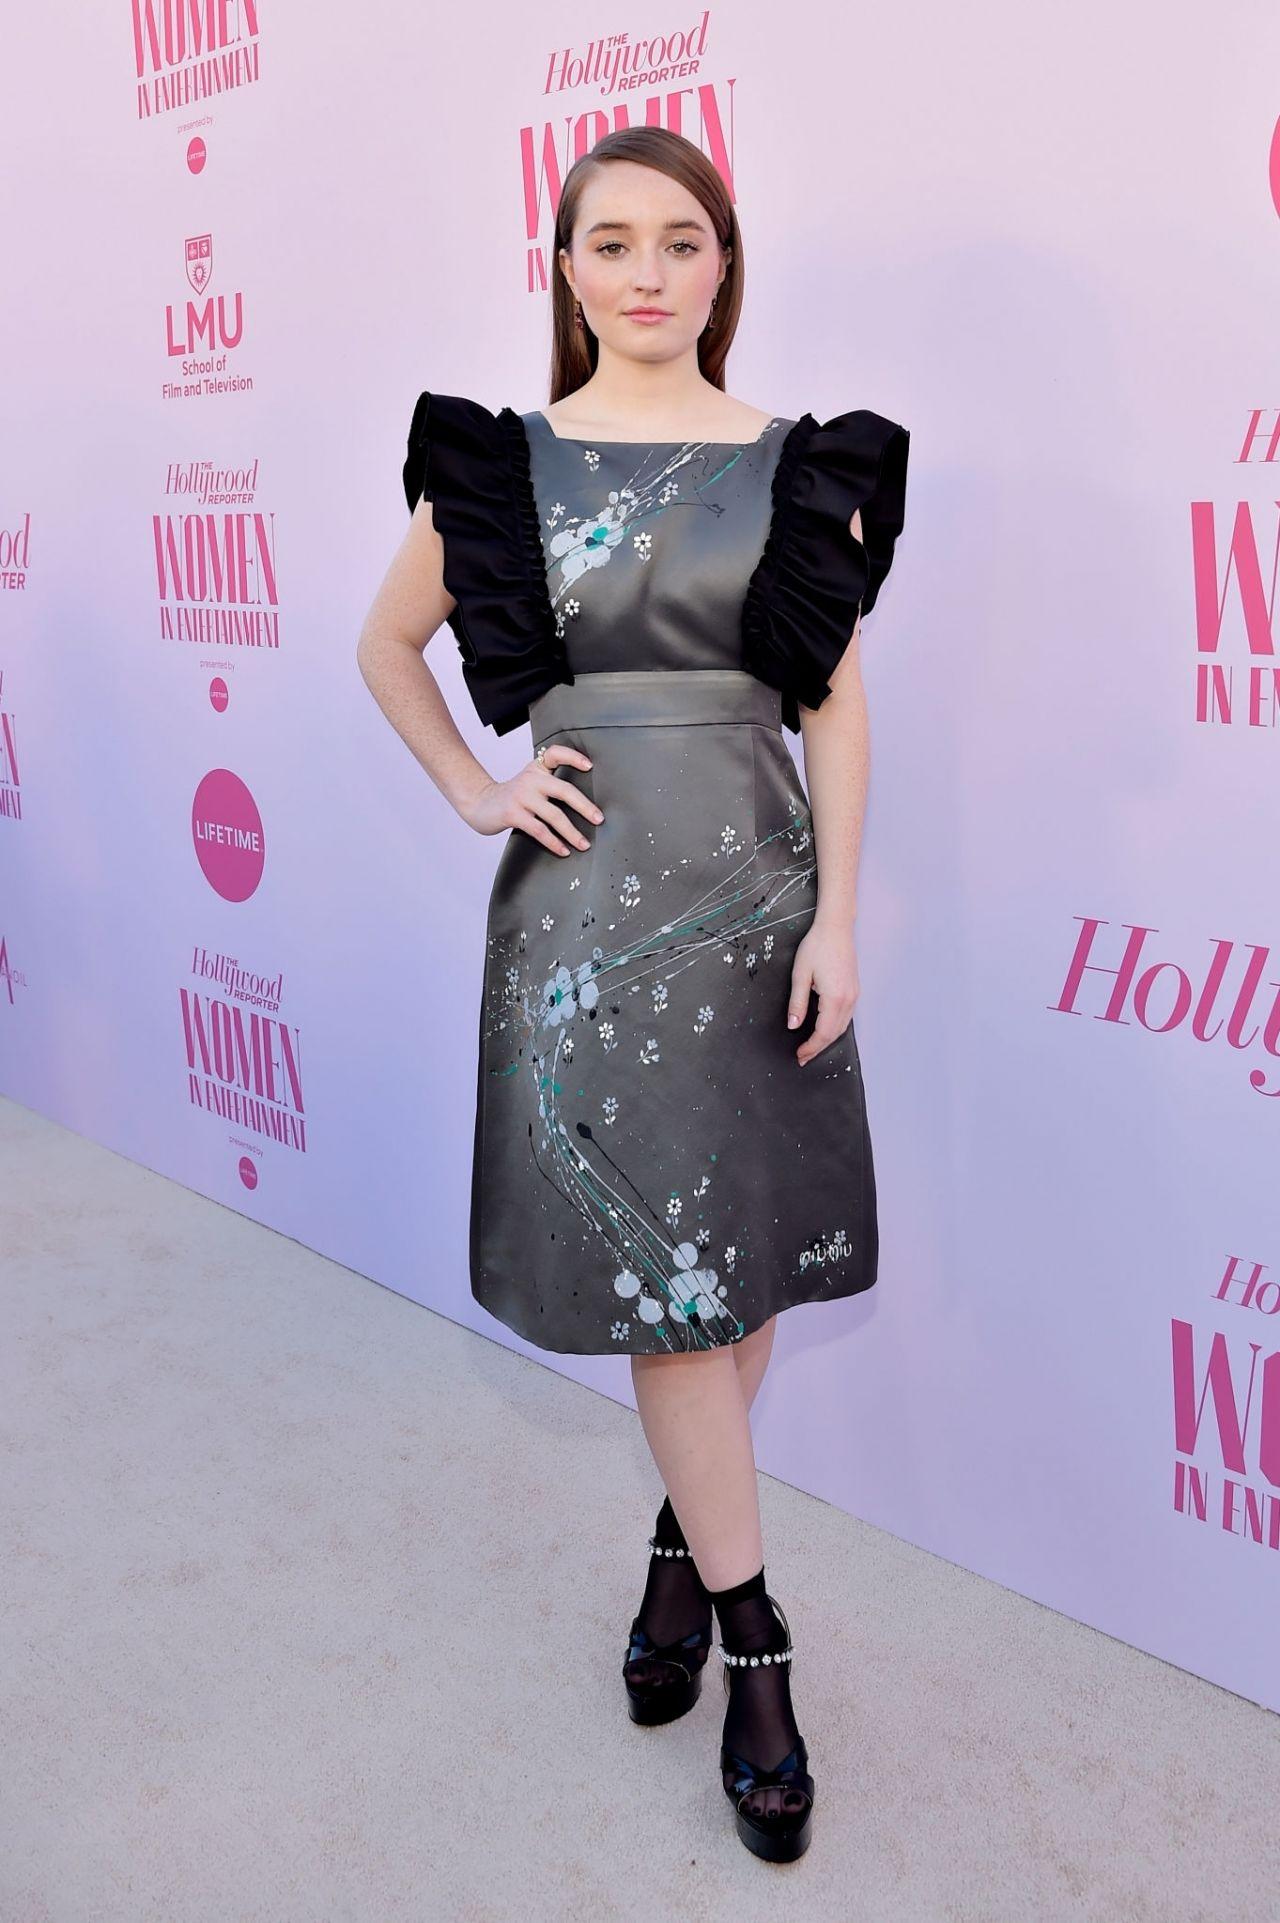 kaitlyn-dever-in-miu-miu-2019-the-hollywood-reporter-women-in-entertainment-breakfast-gala